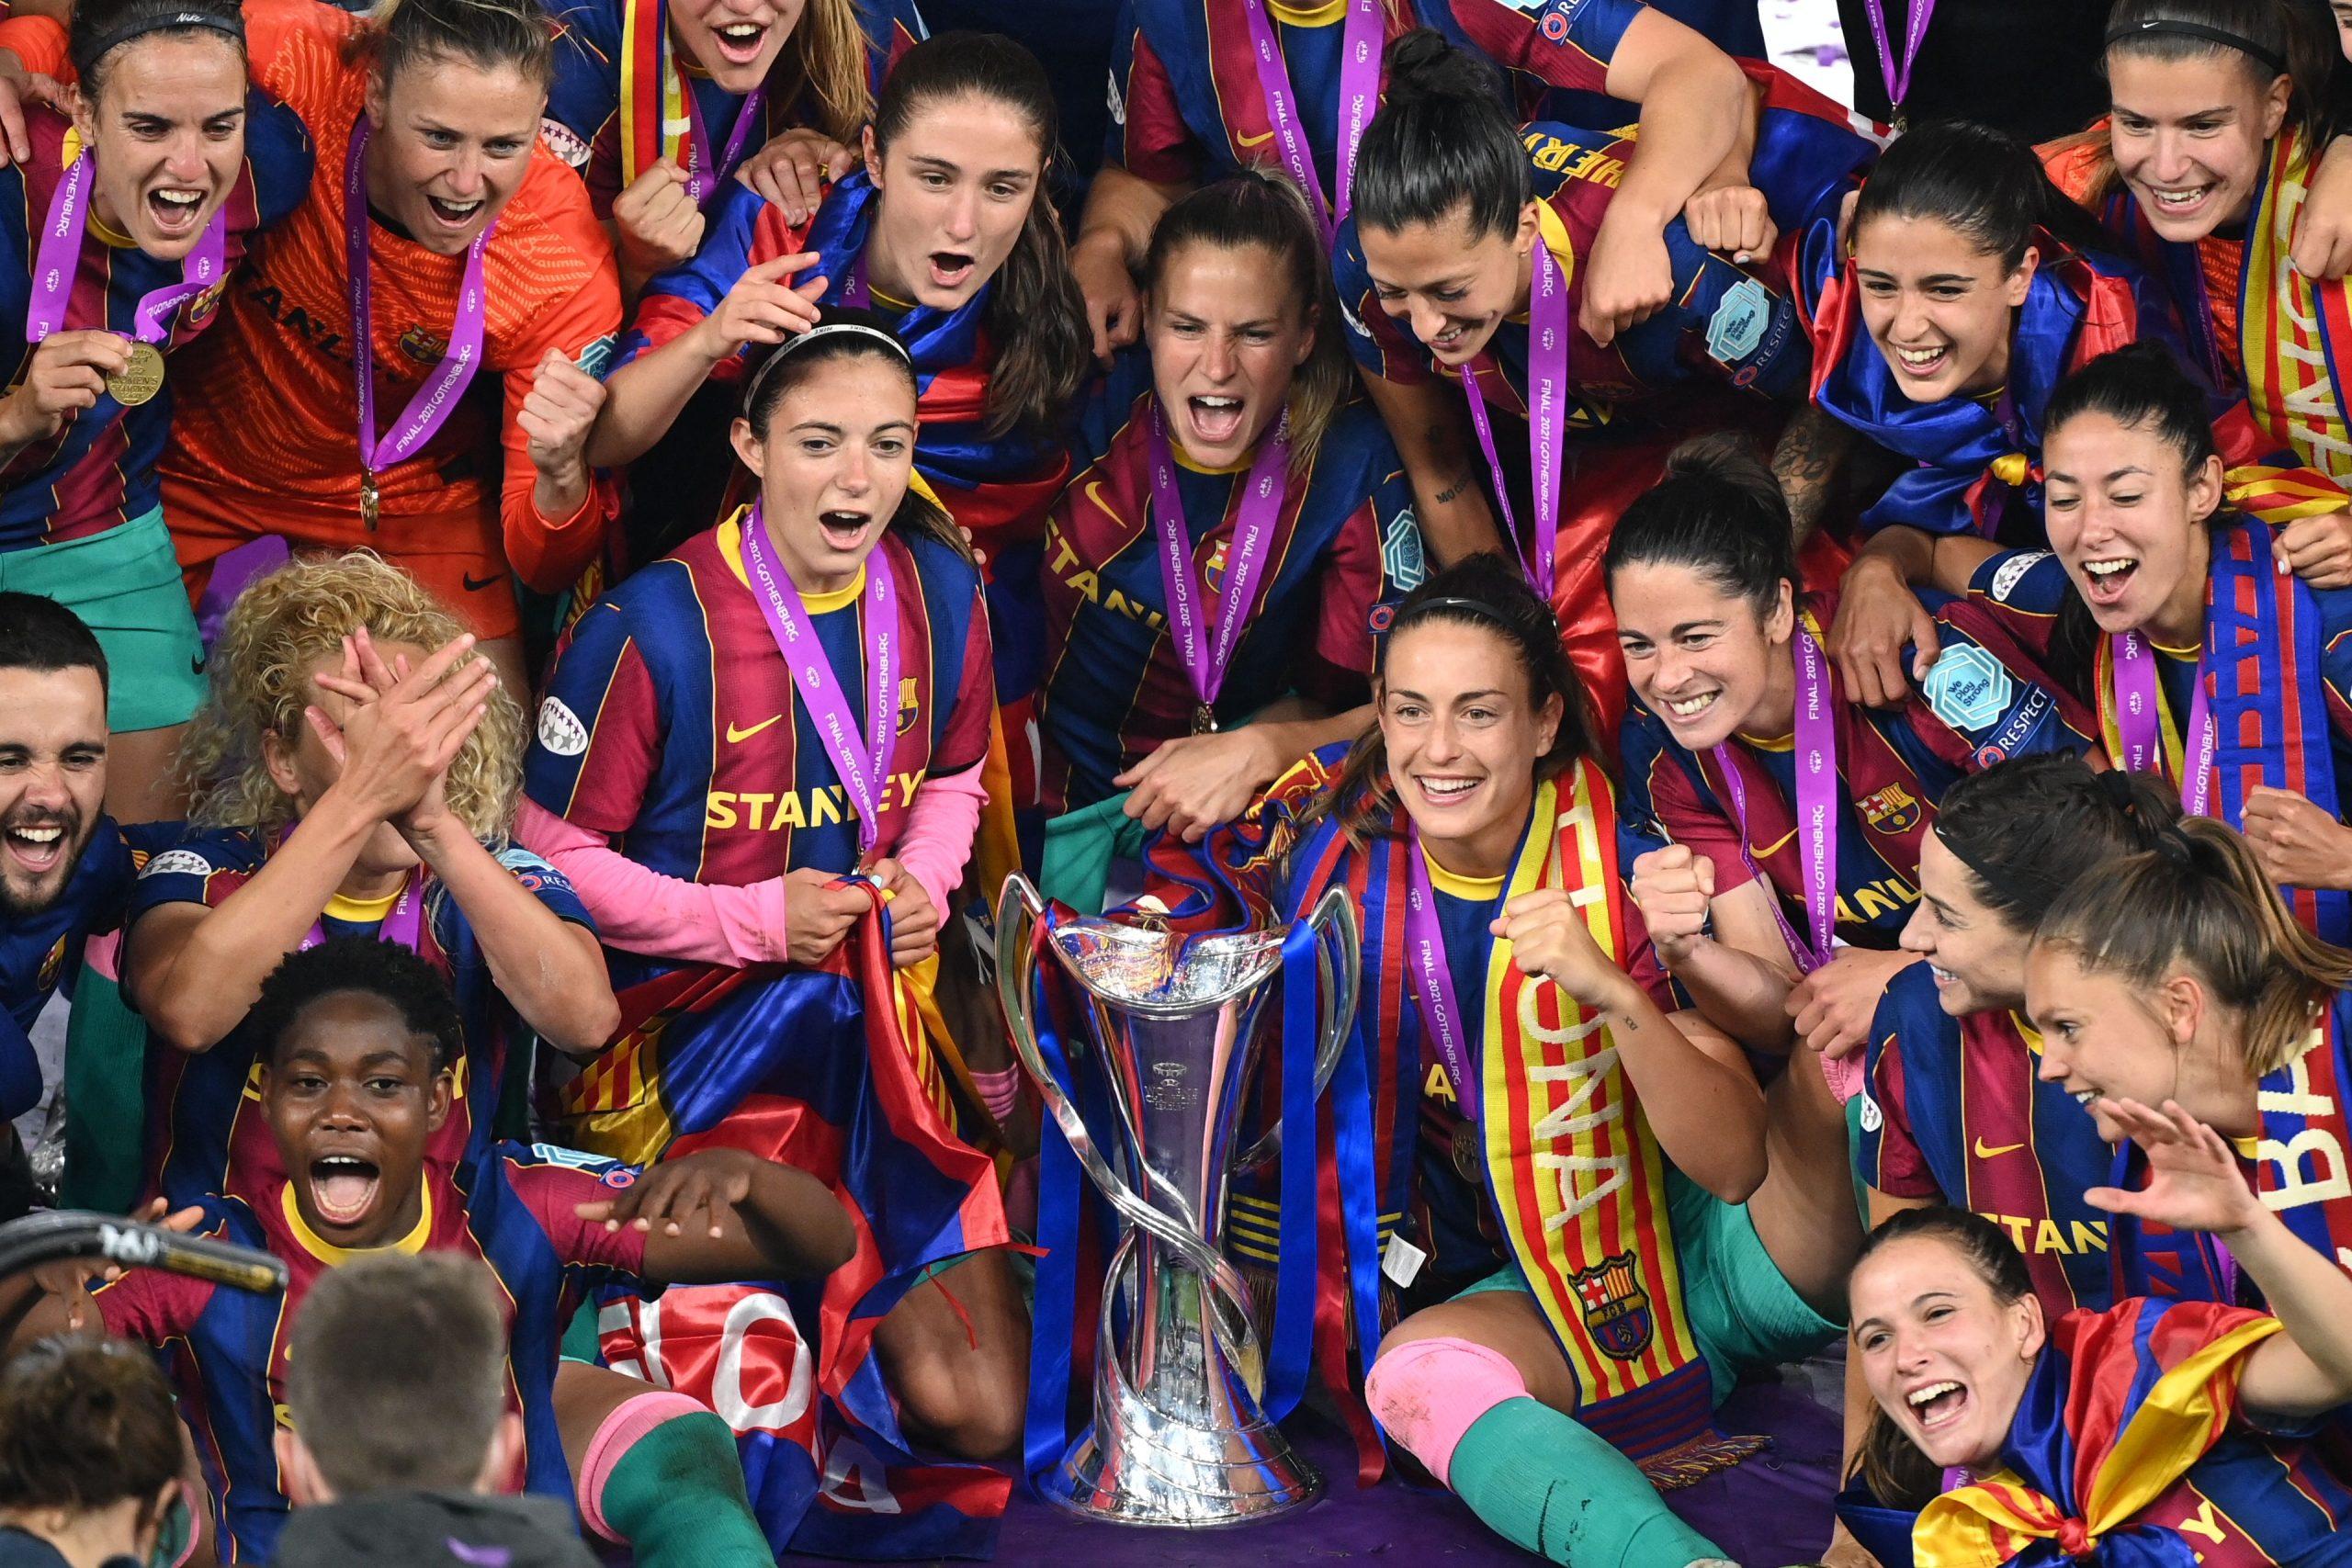 UEFA Women's Champions League 2021-22: The Biggest Season Yet